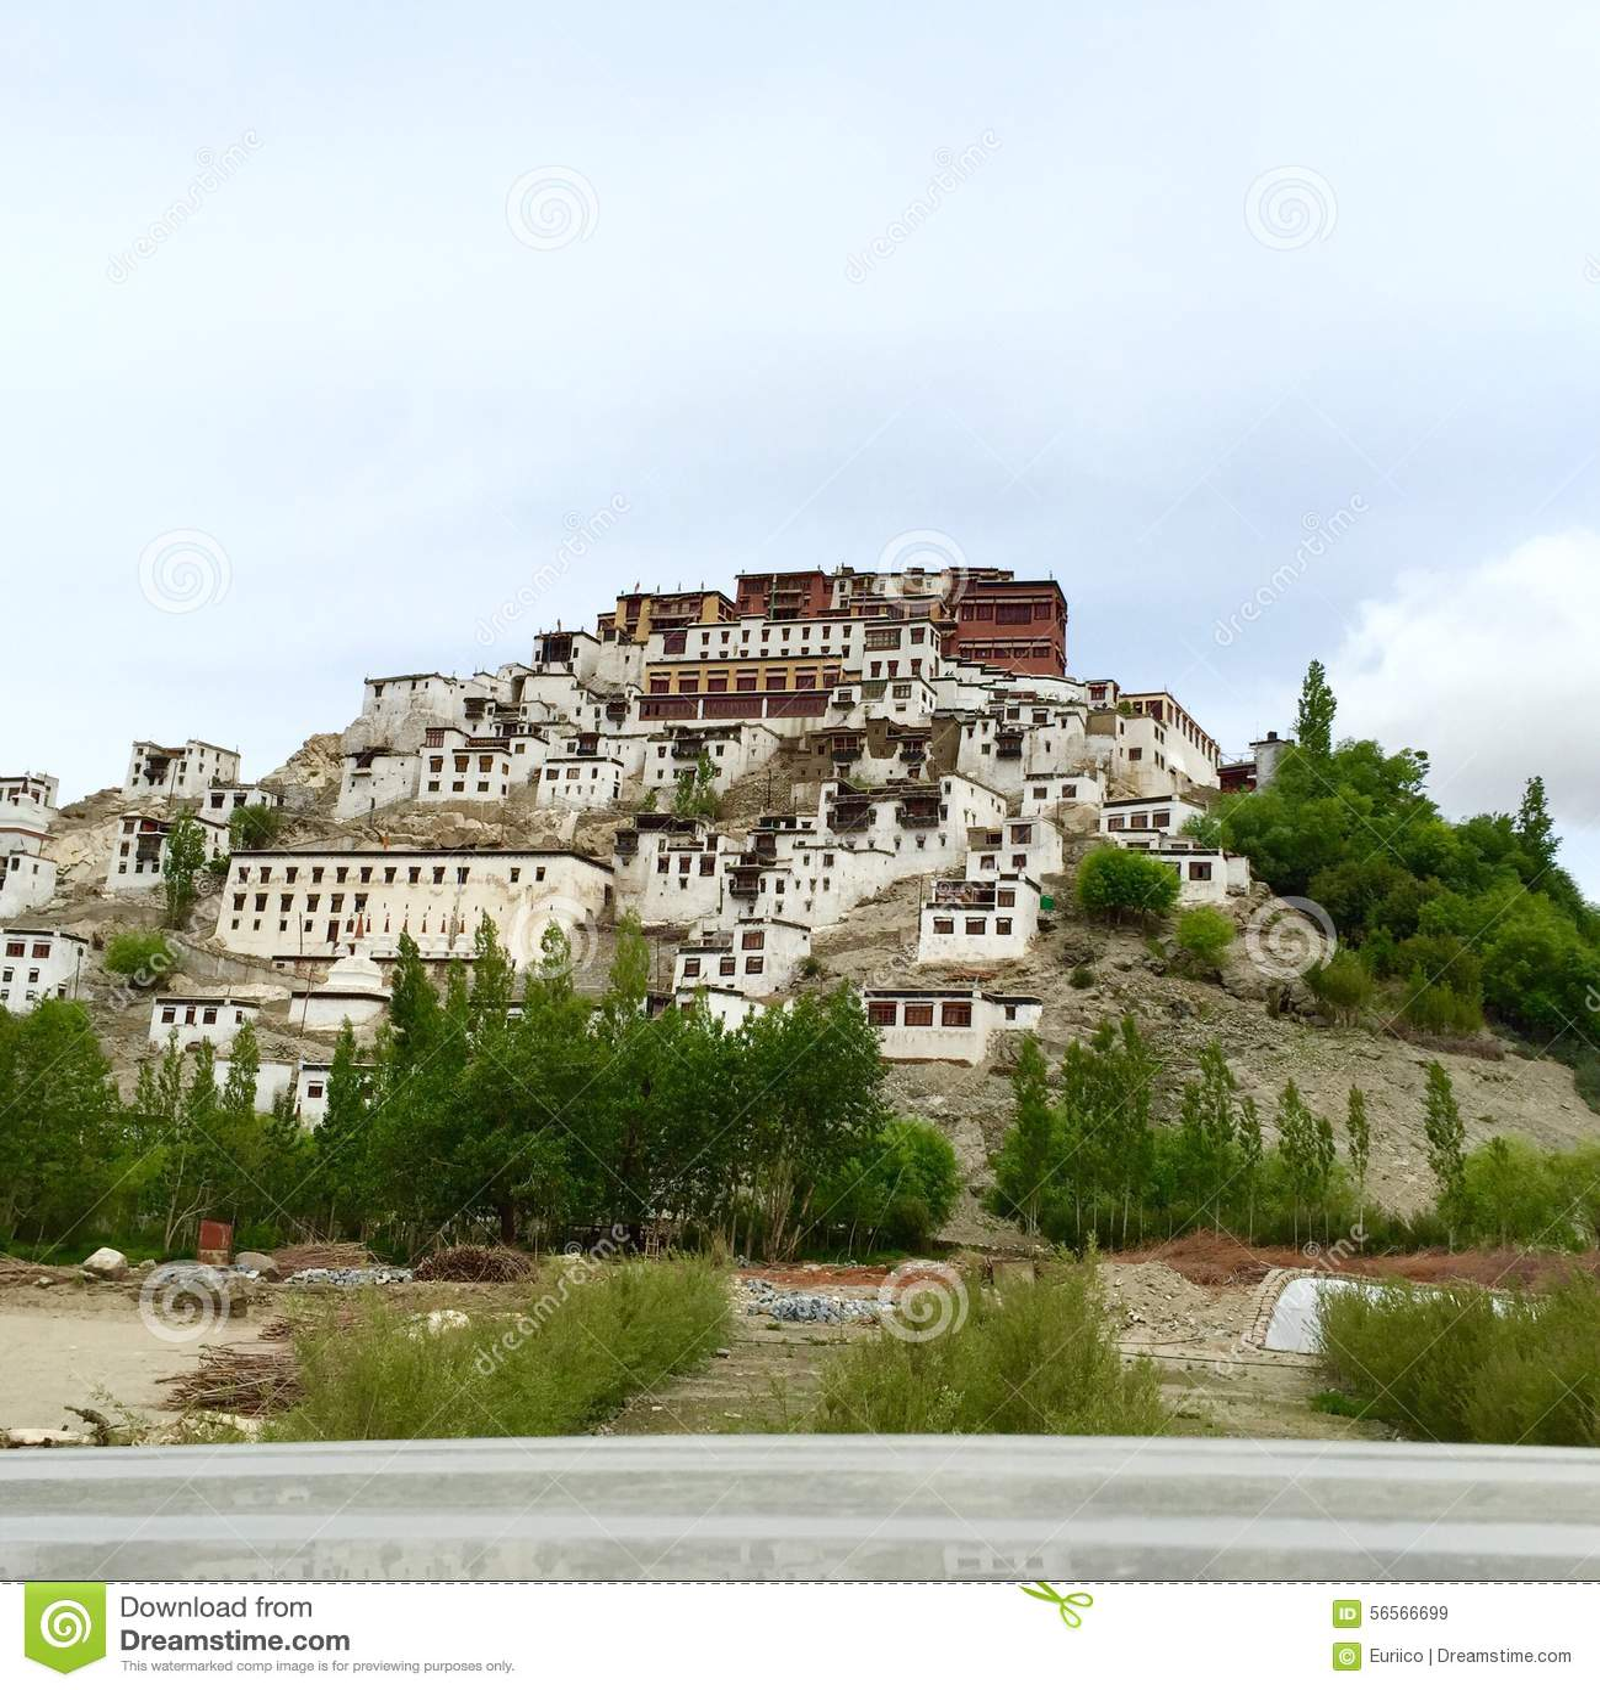 Download Μοναστήρι Thiksay σε Leh, Ινδία Στοκ Εικόνα - εικόνα από σύνθετος, μέτρα: 56566699